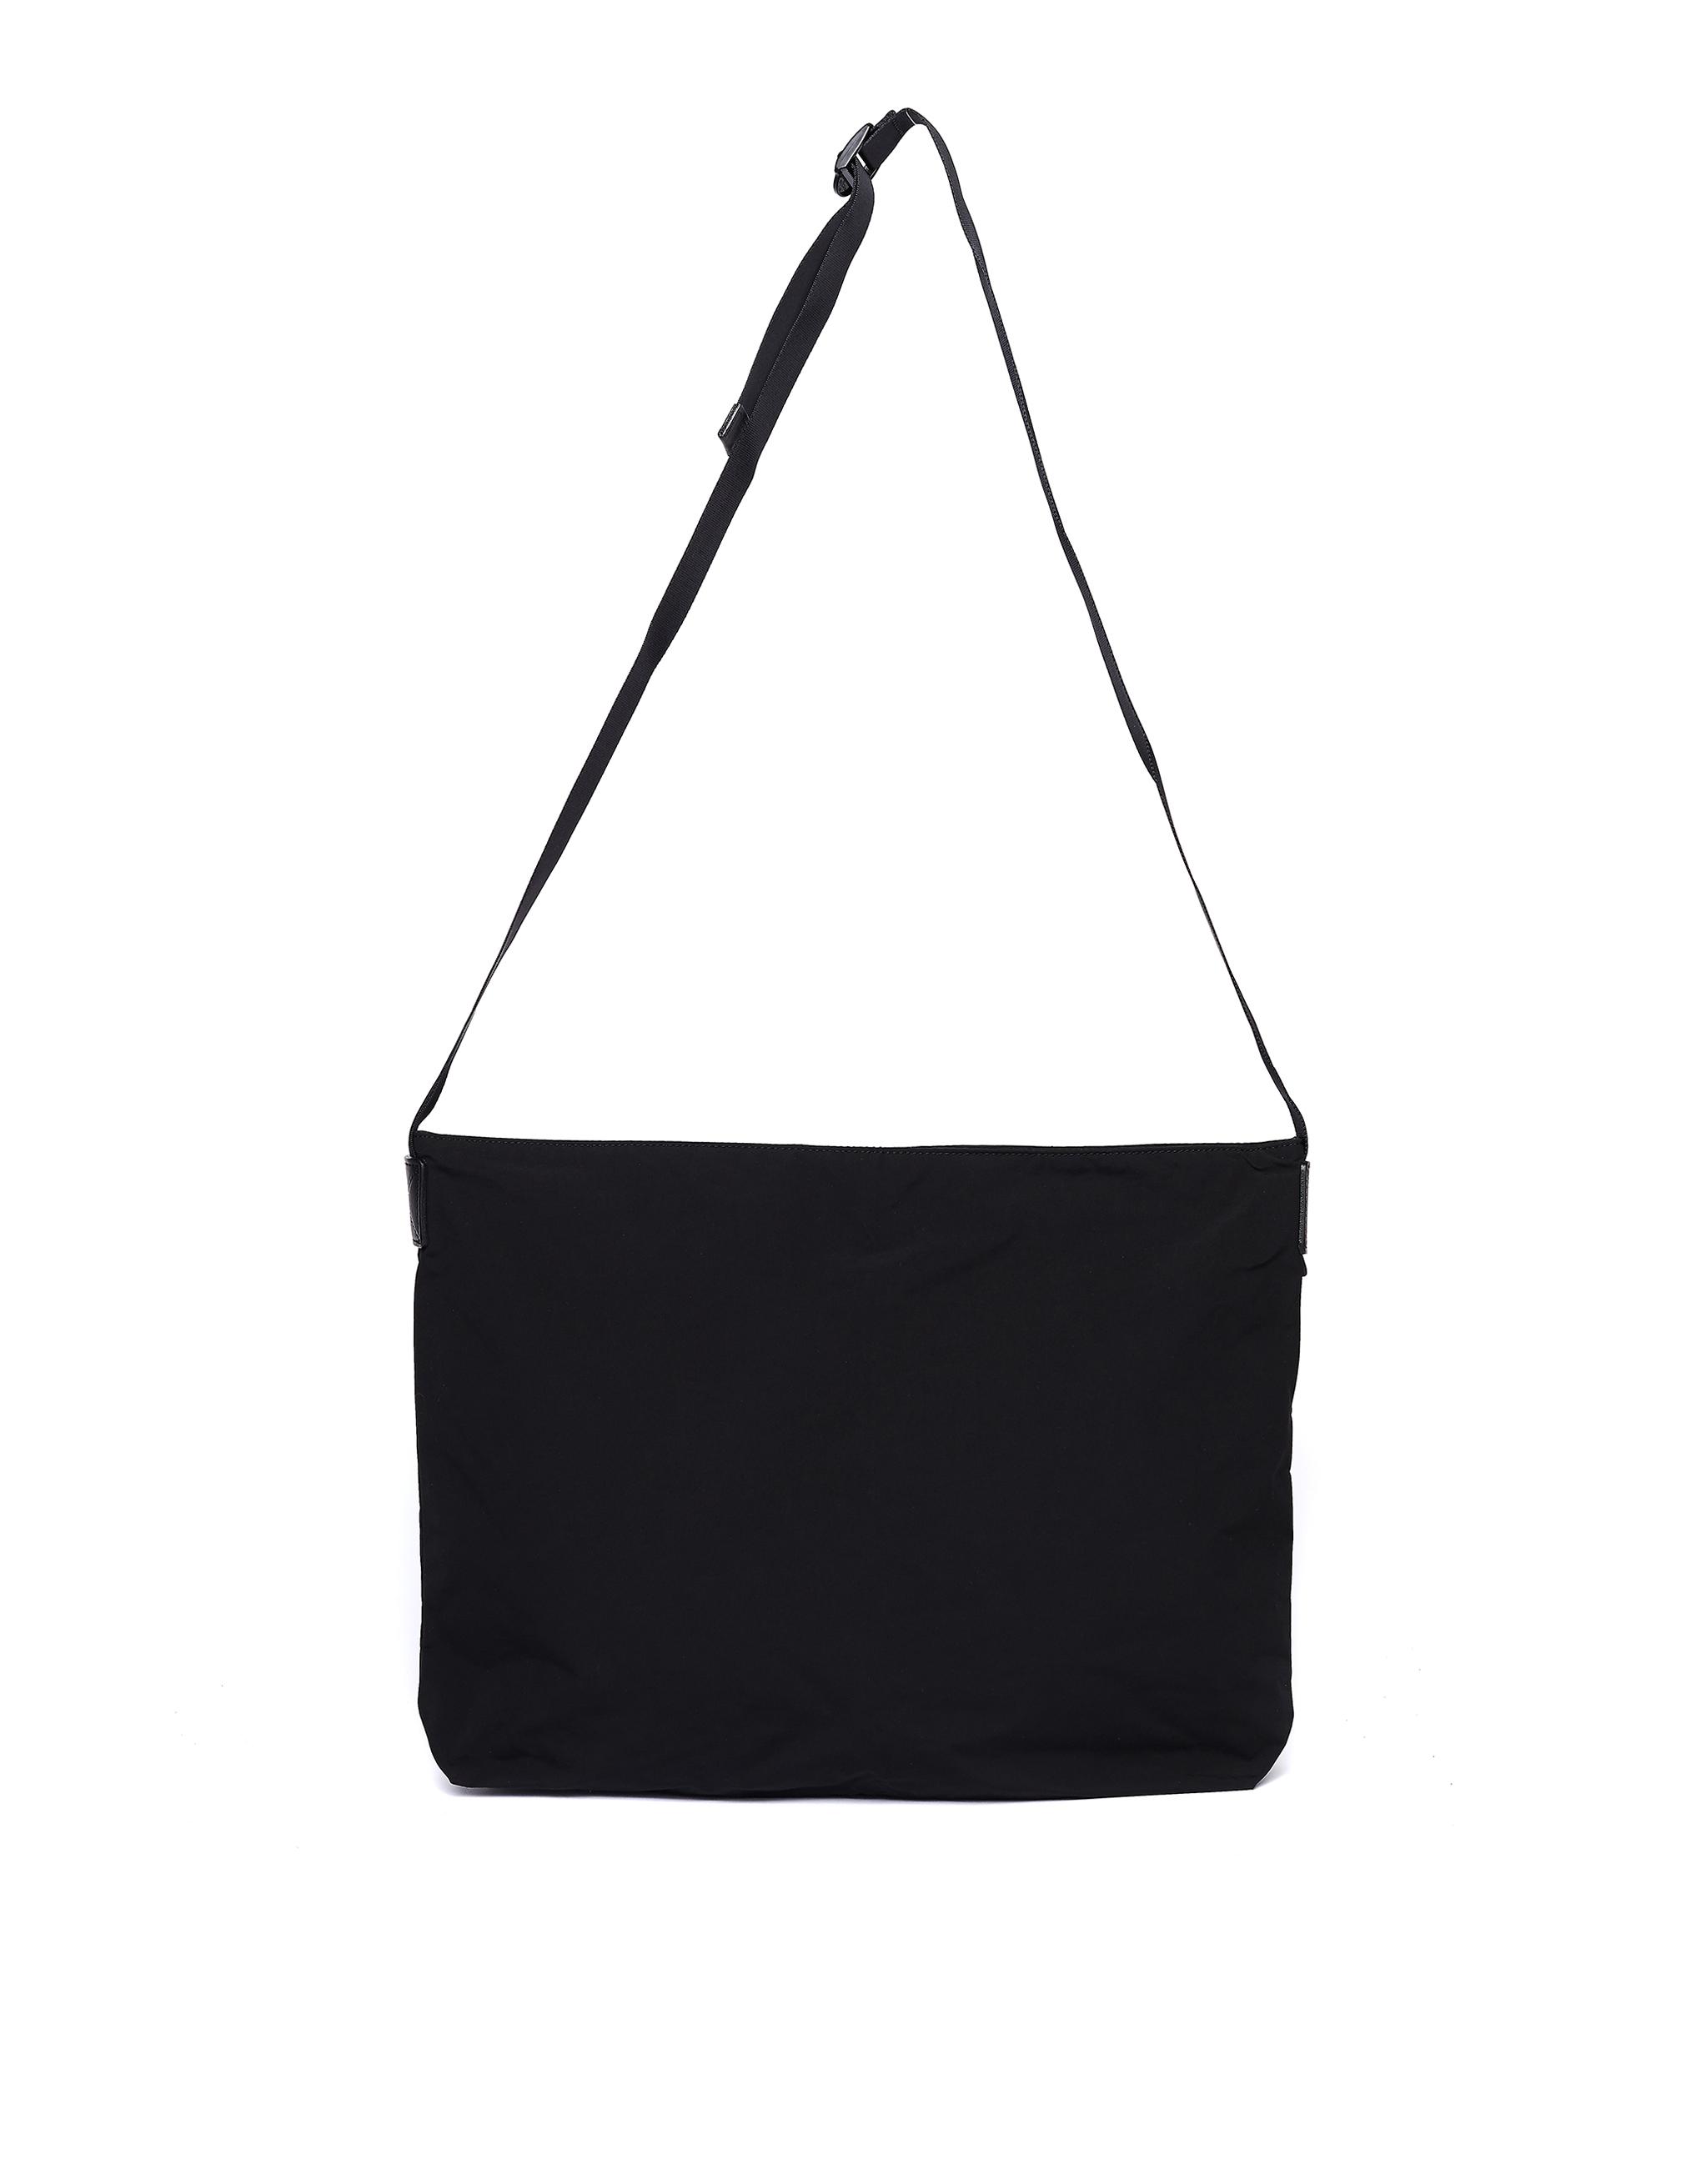 Hender Scheme All Purpose Shoulder Bag in Black Nylon